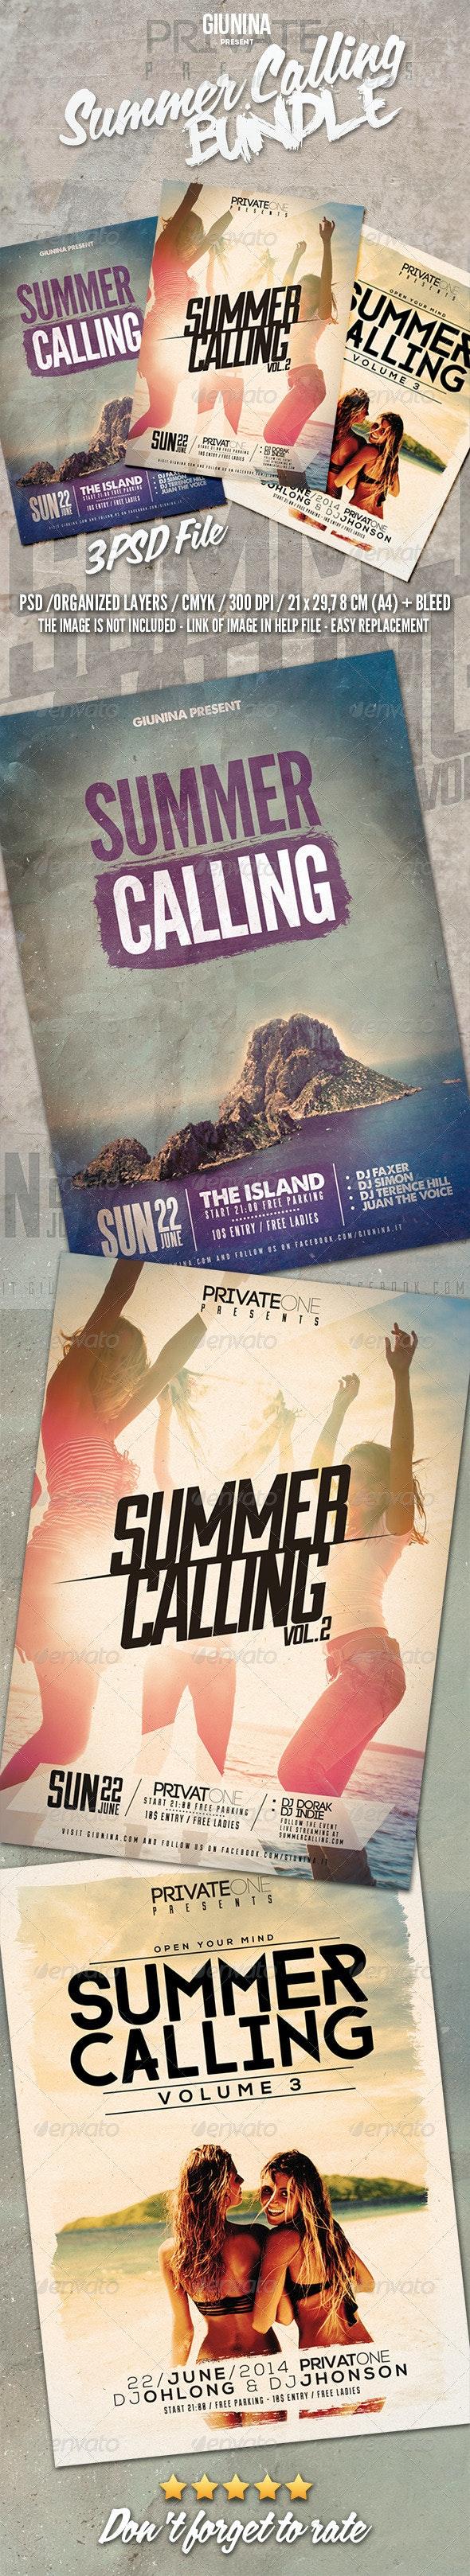 Summer Calling Flyer/Poster Bundle Vol.1-3 - Events Flyers